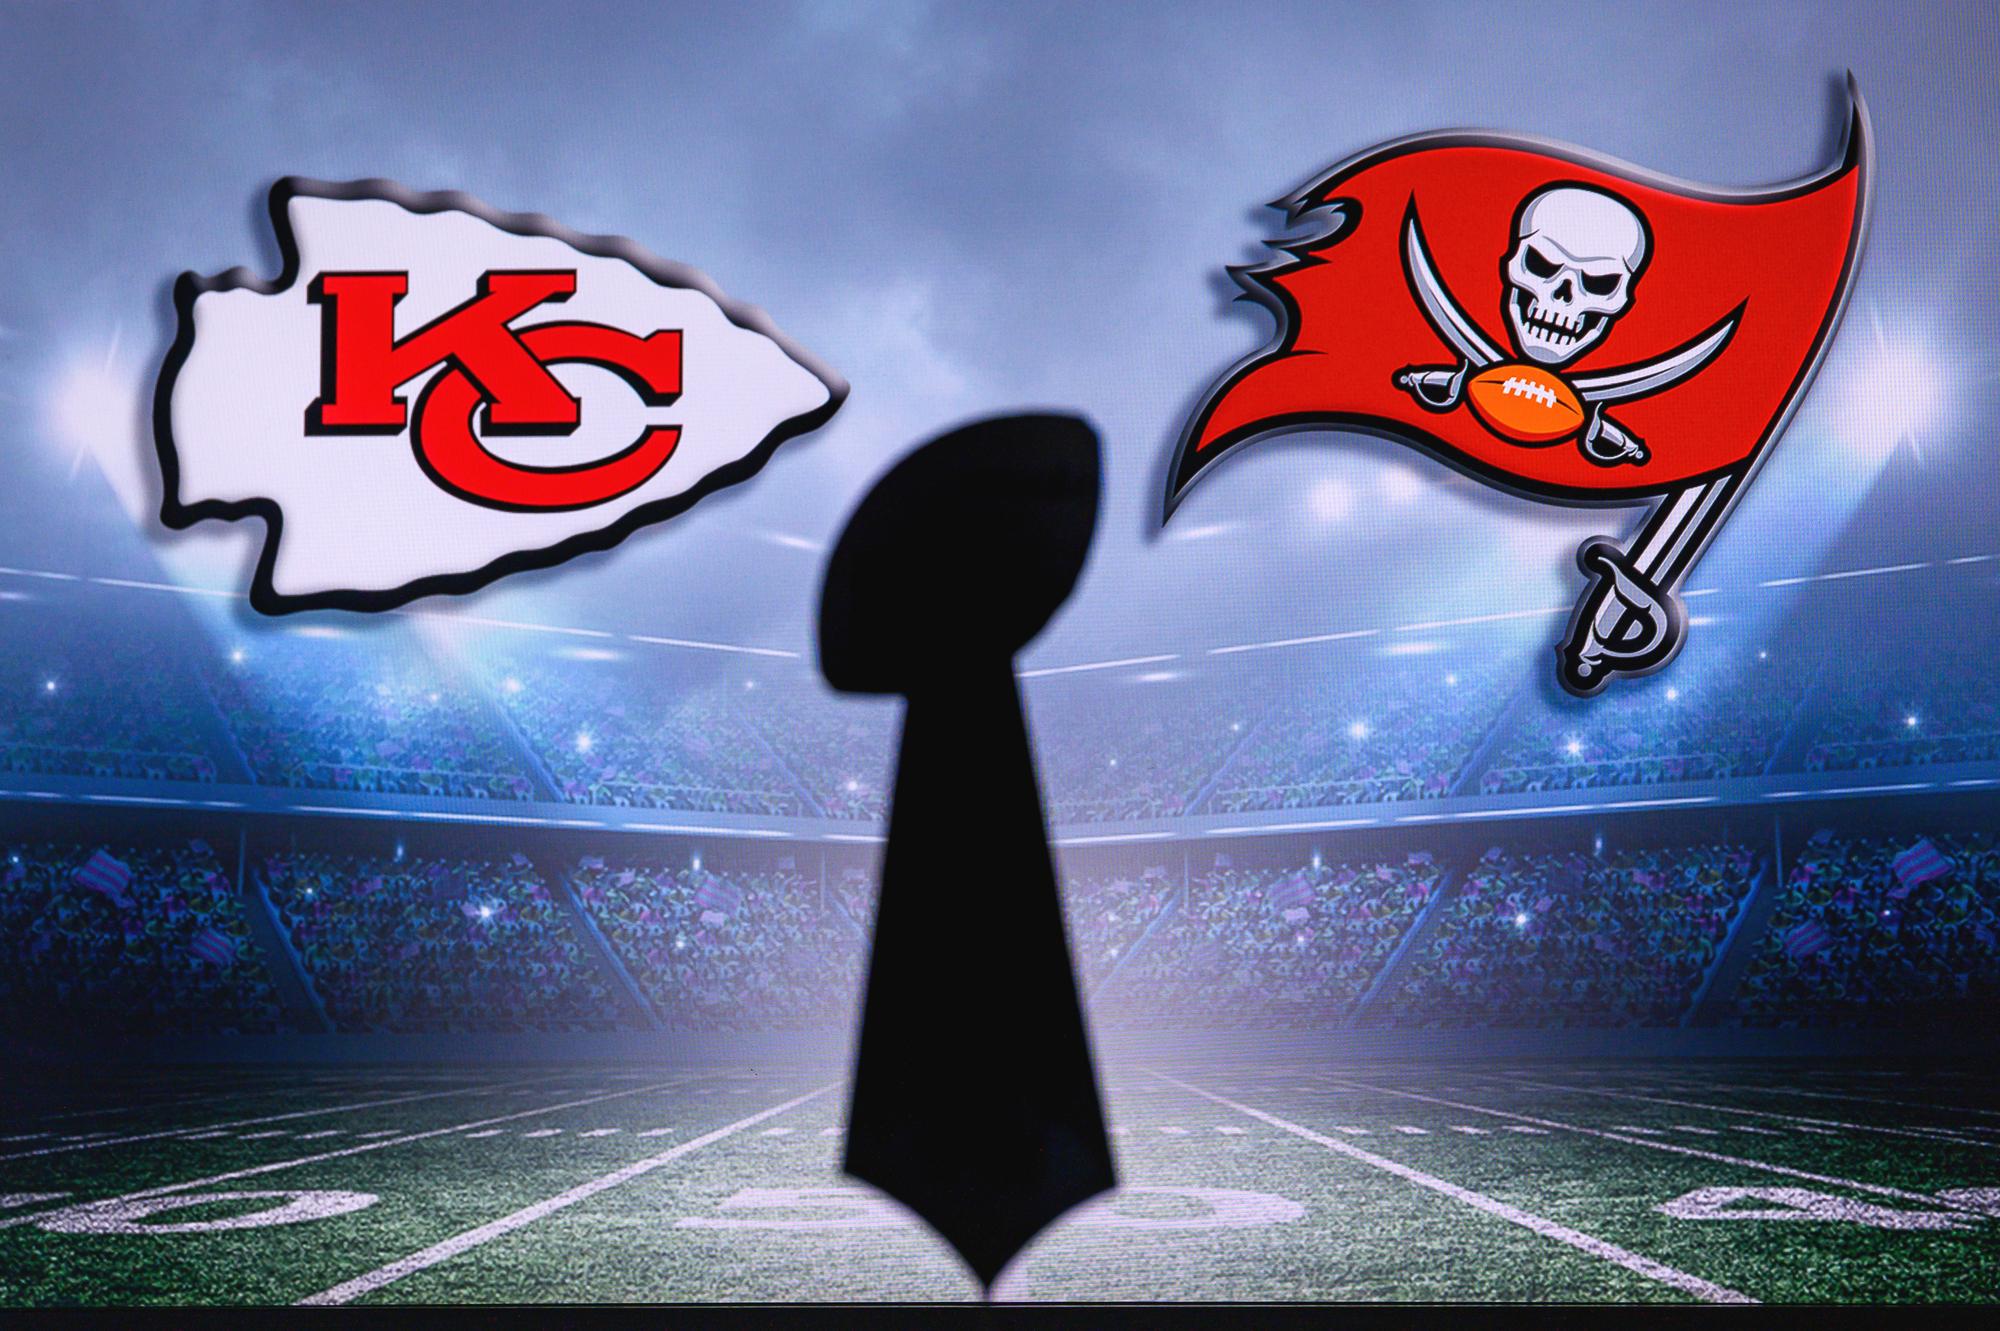 Super Bowl Preview 2021 – Kansas City Chiefs vs. Tampa Bay Buccaneers